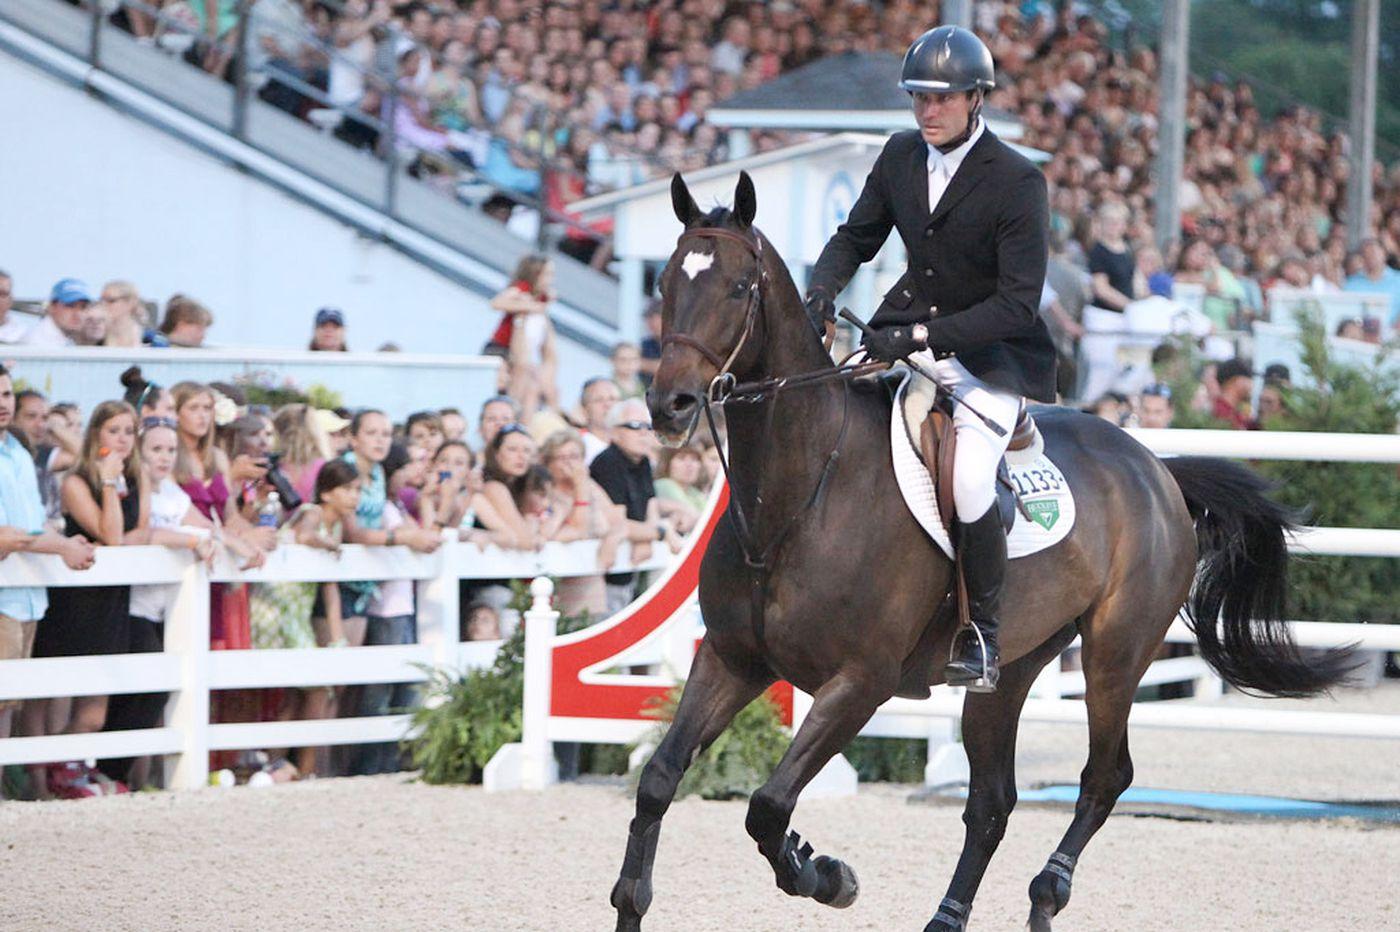 Ousted Devon Horse Show president calls change a 'hostile takeover'